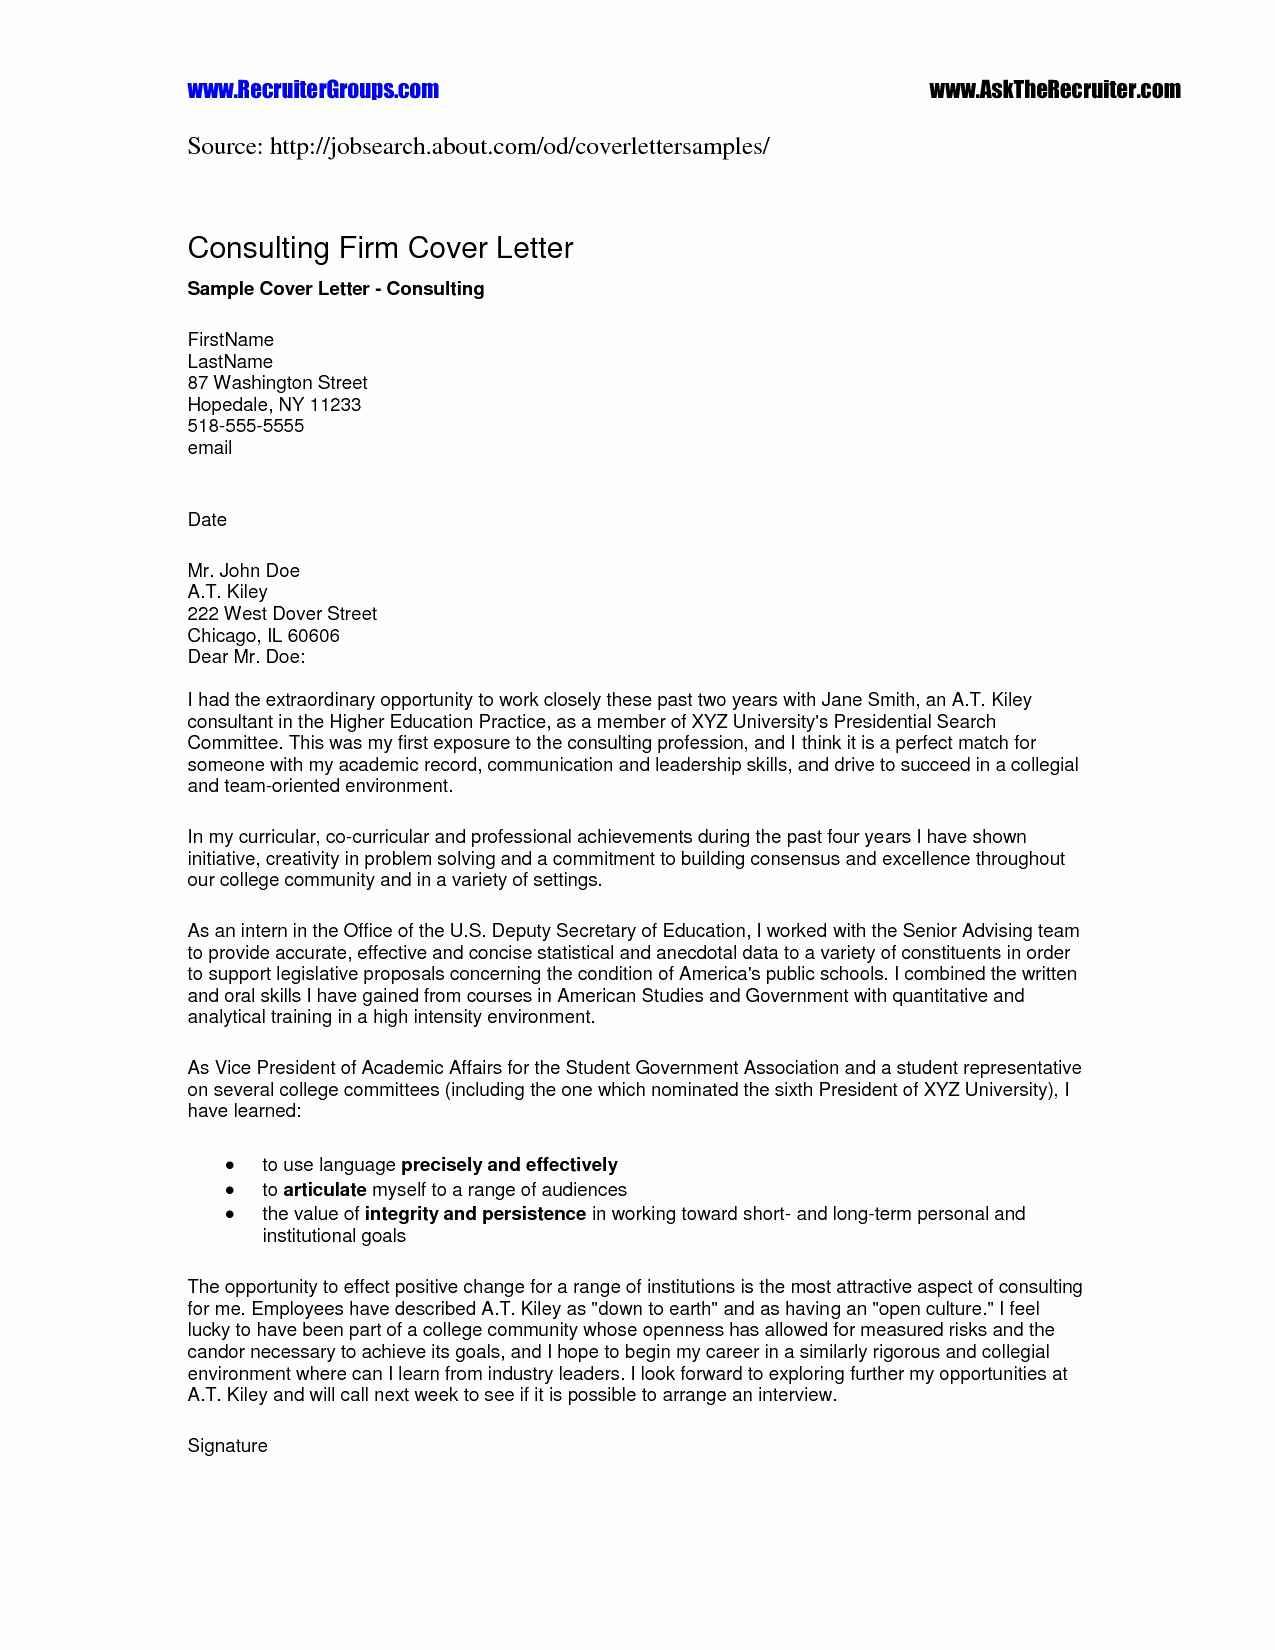 Resignation Letter Template Word - Engineering Internship Resume Template Word Inspirational Employment